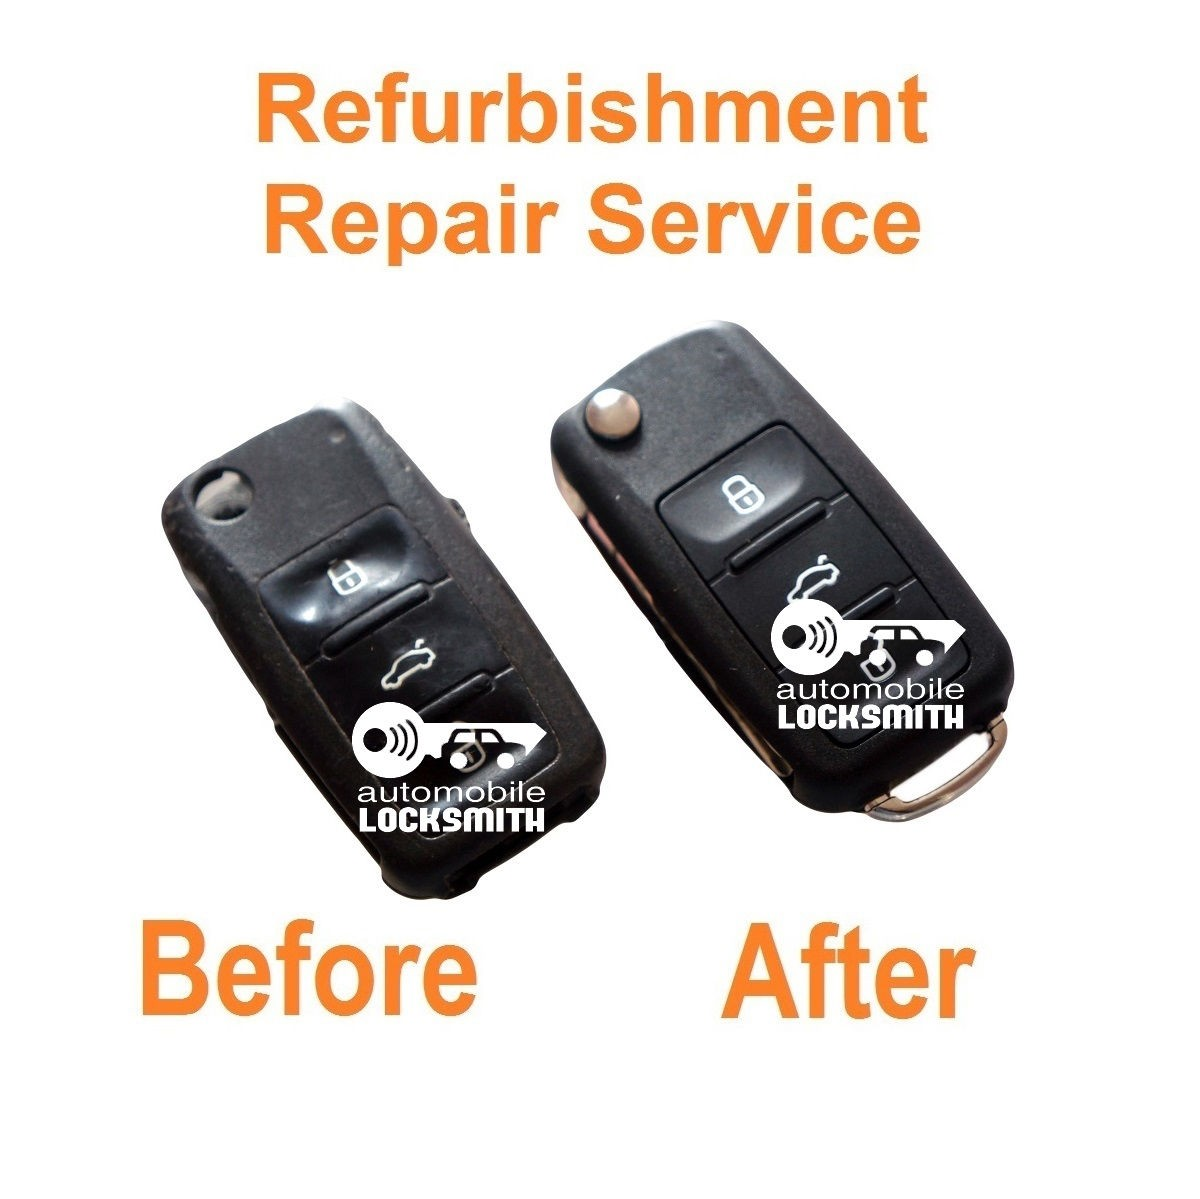 Repair Service for Skoda Octavia Fabia Roomster 3 button remote flip key